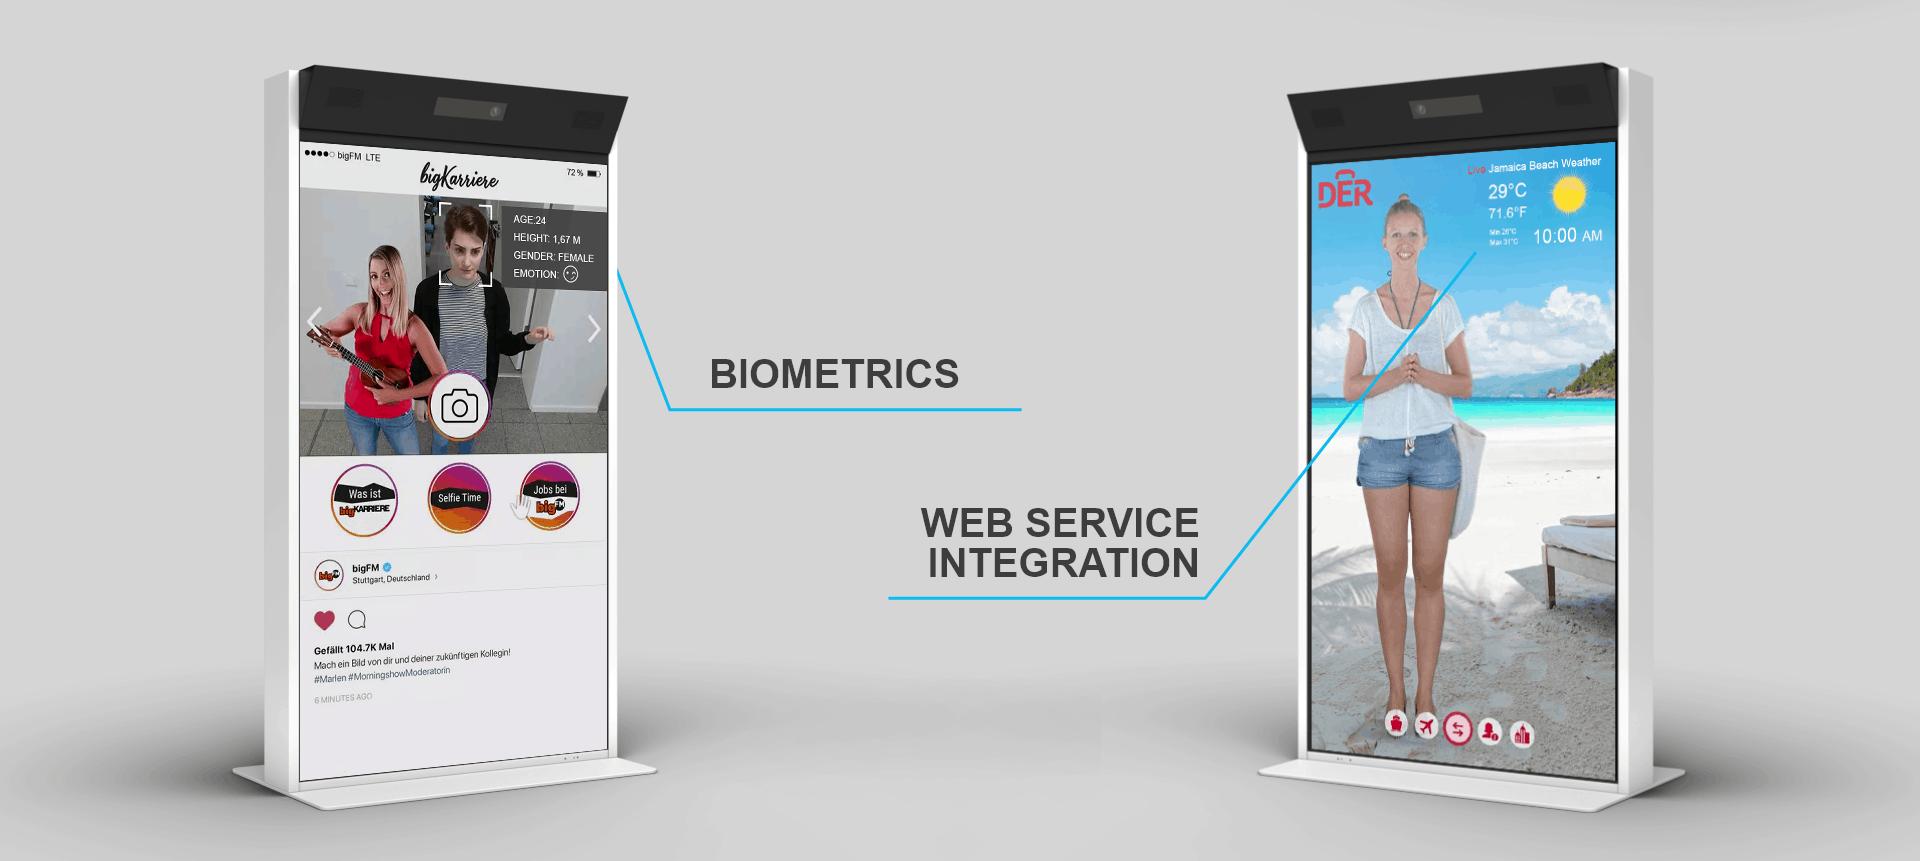 Biometrics WEB SERVICE